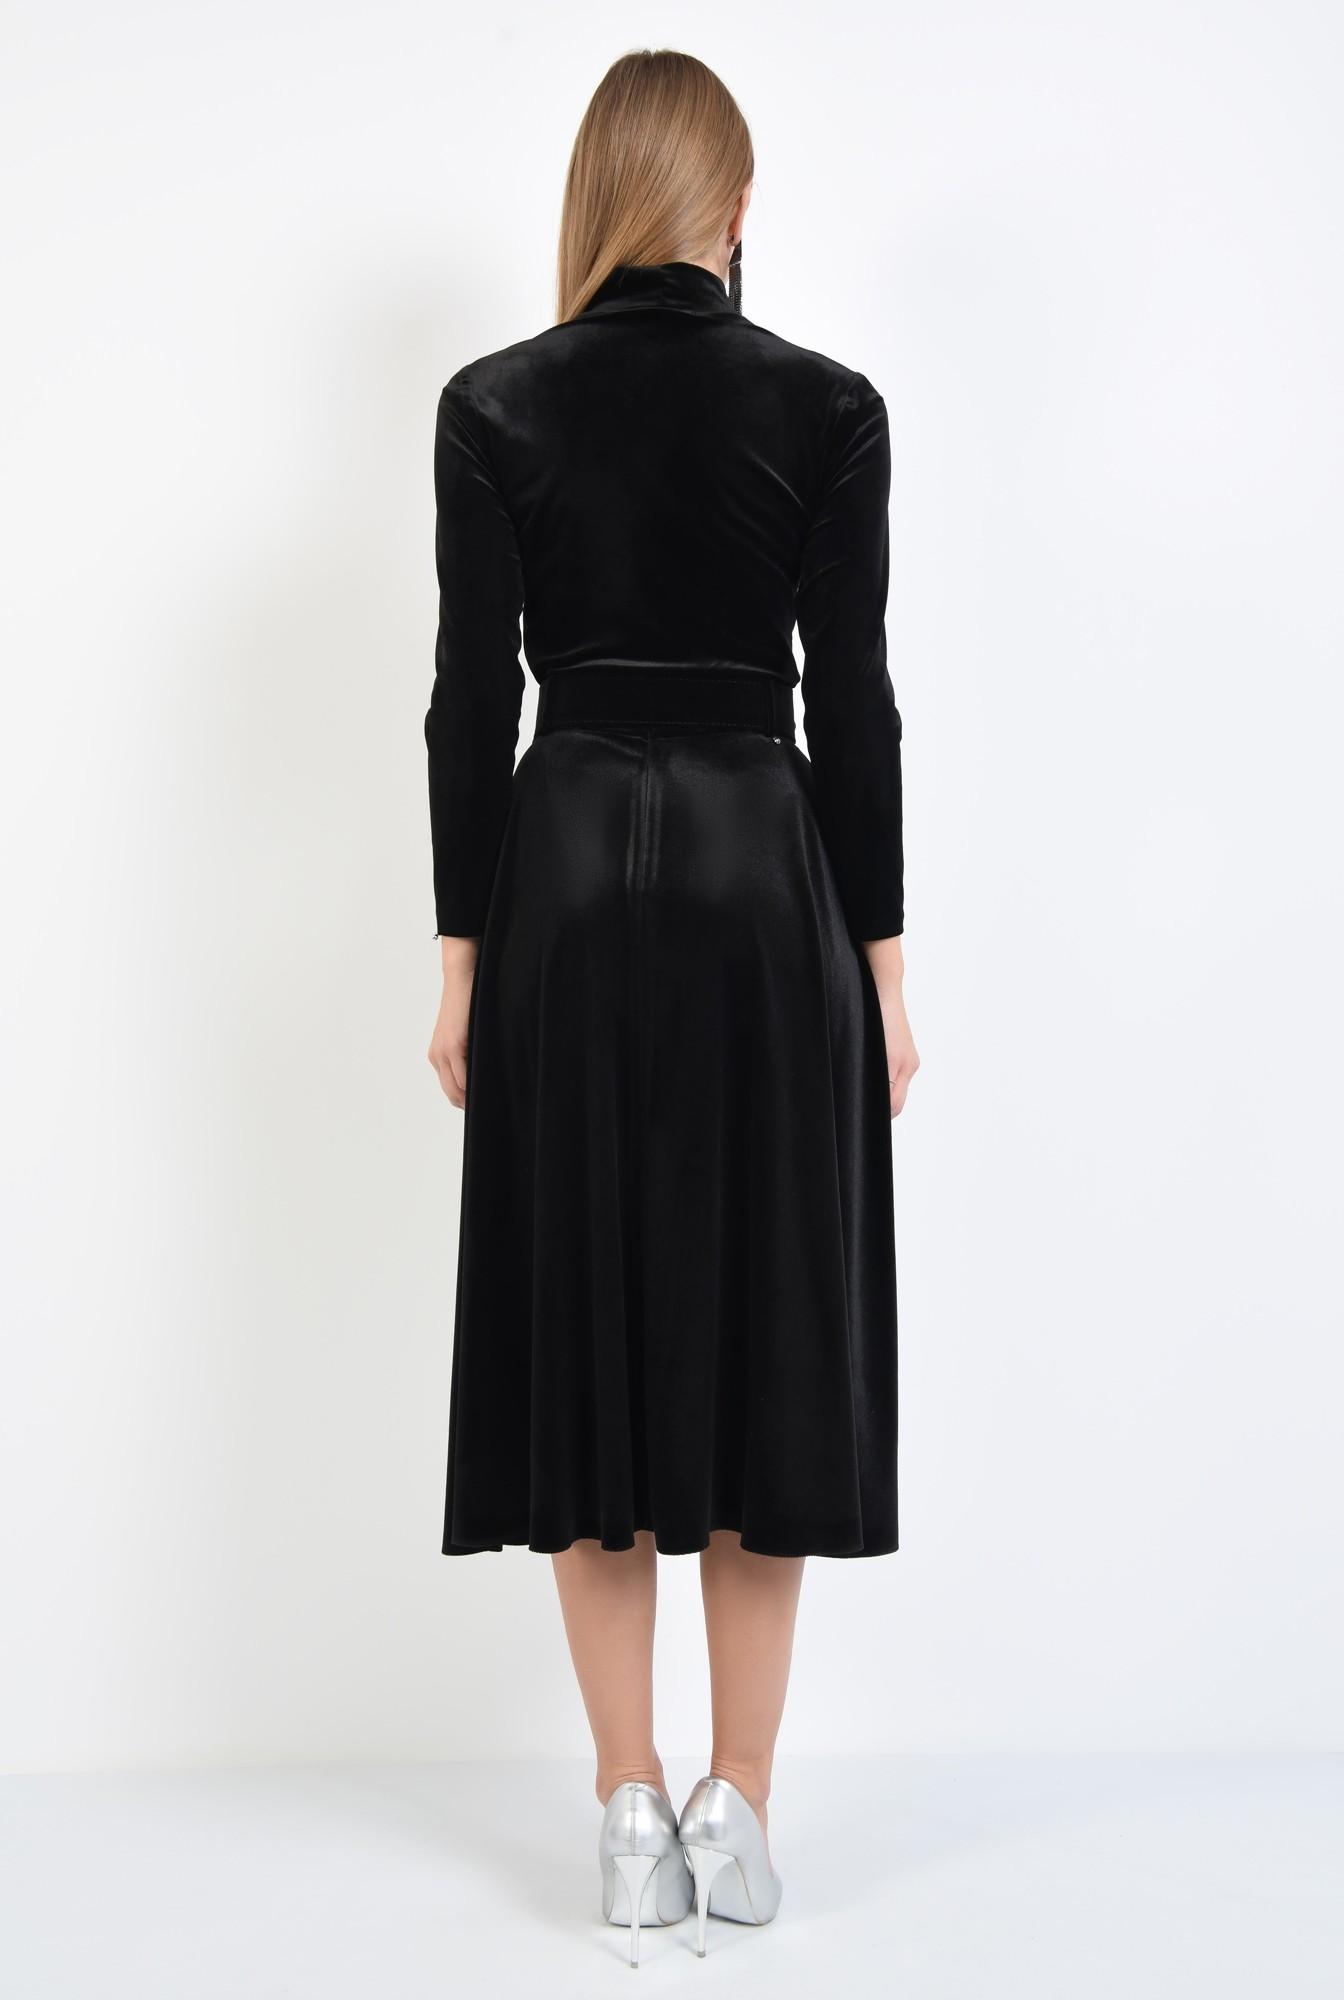 1 - fusta eleganta, neagra, midi, clos, cu centura